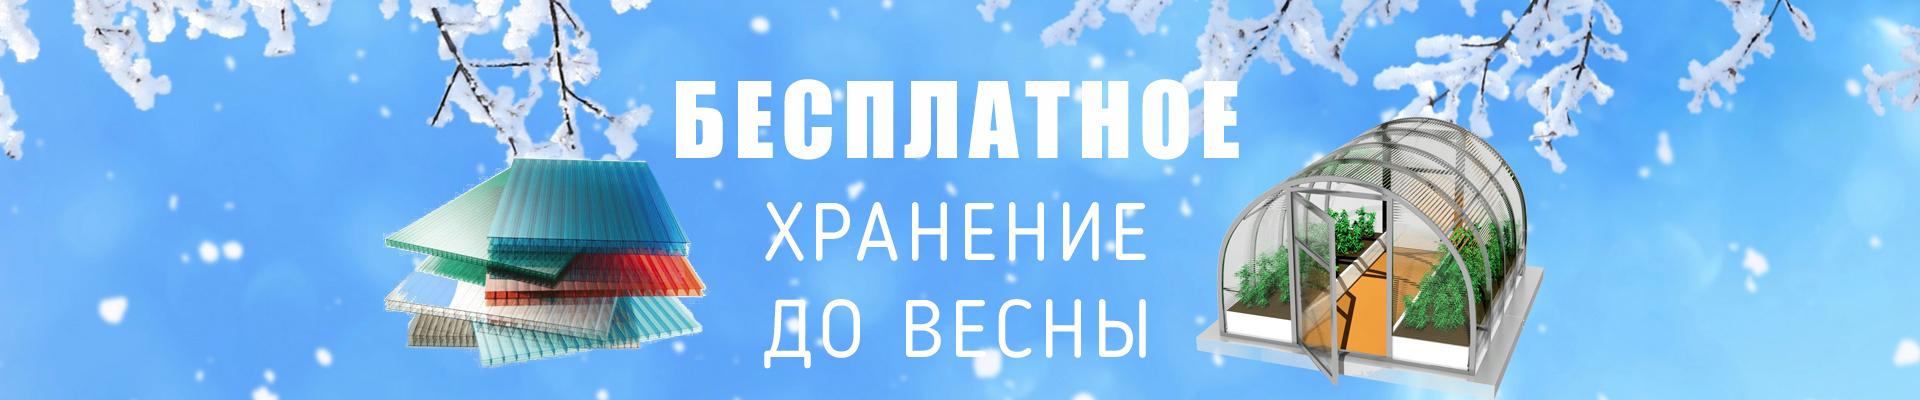 sl-zima